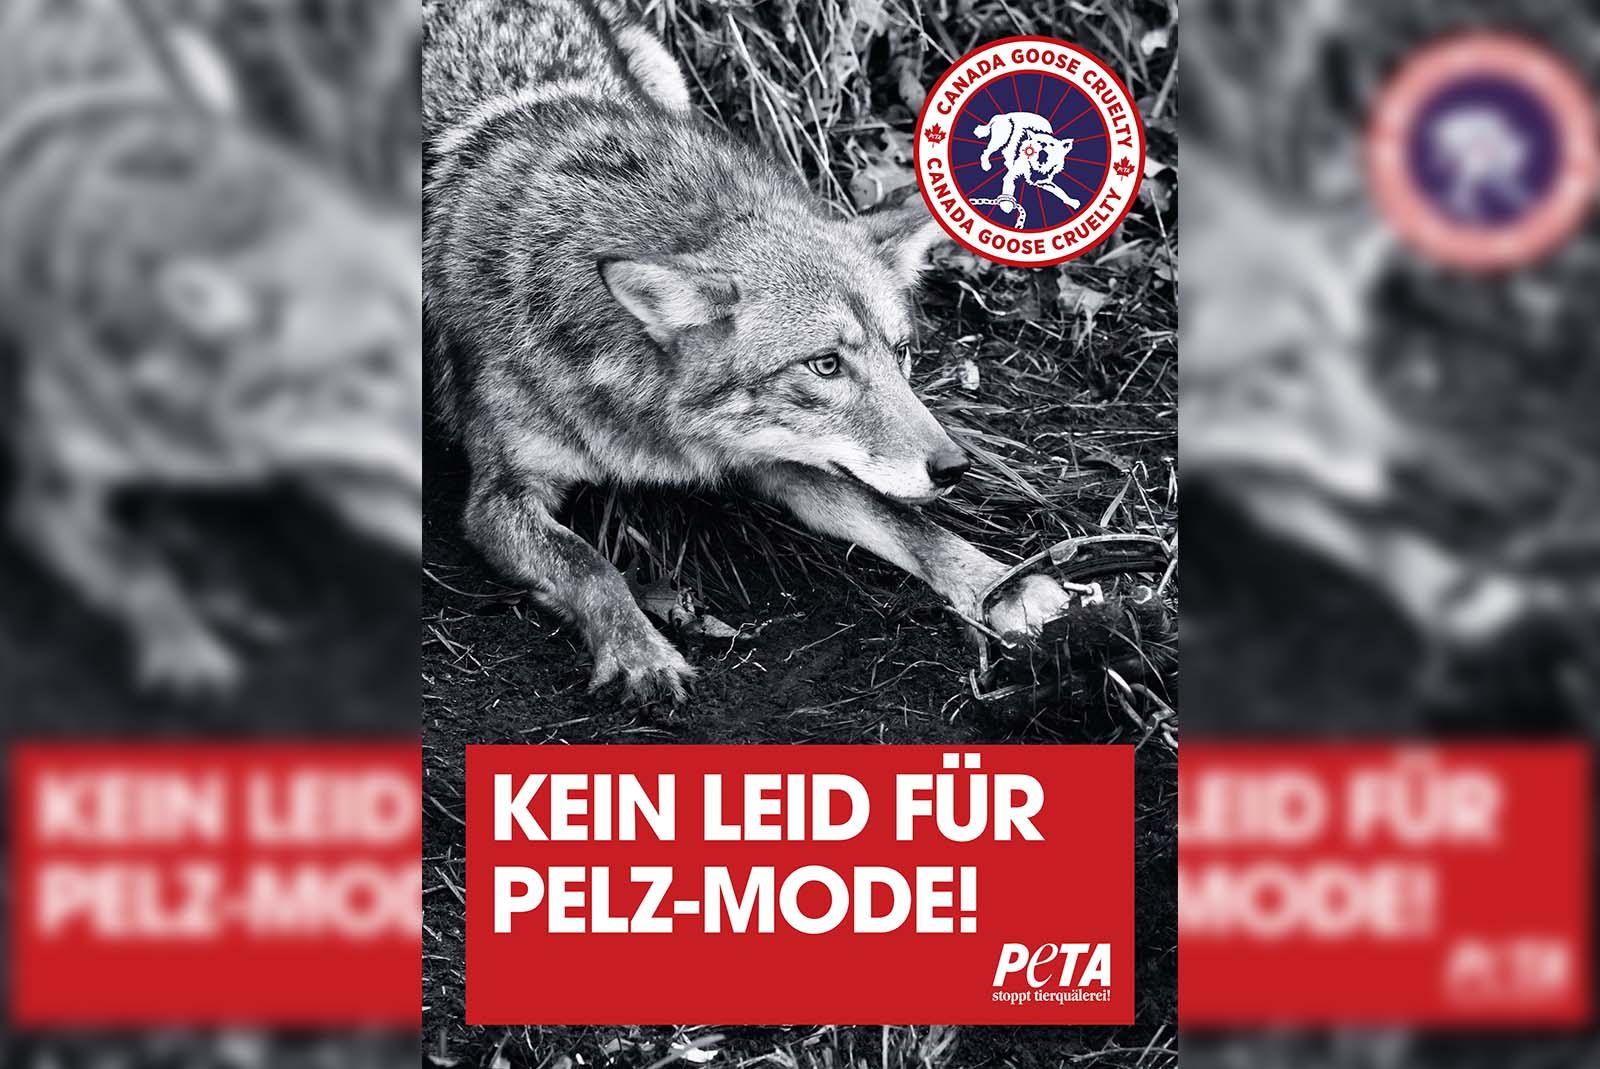 Demo Pakete Peta Deutschland Ev